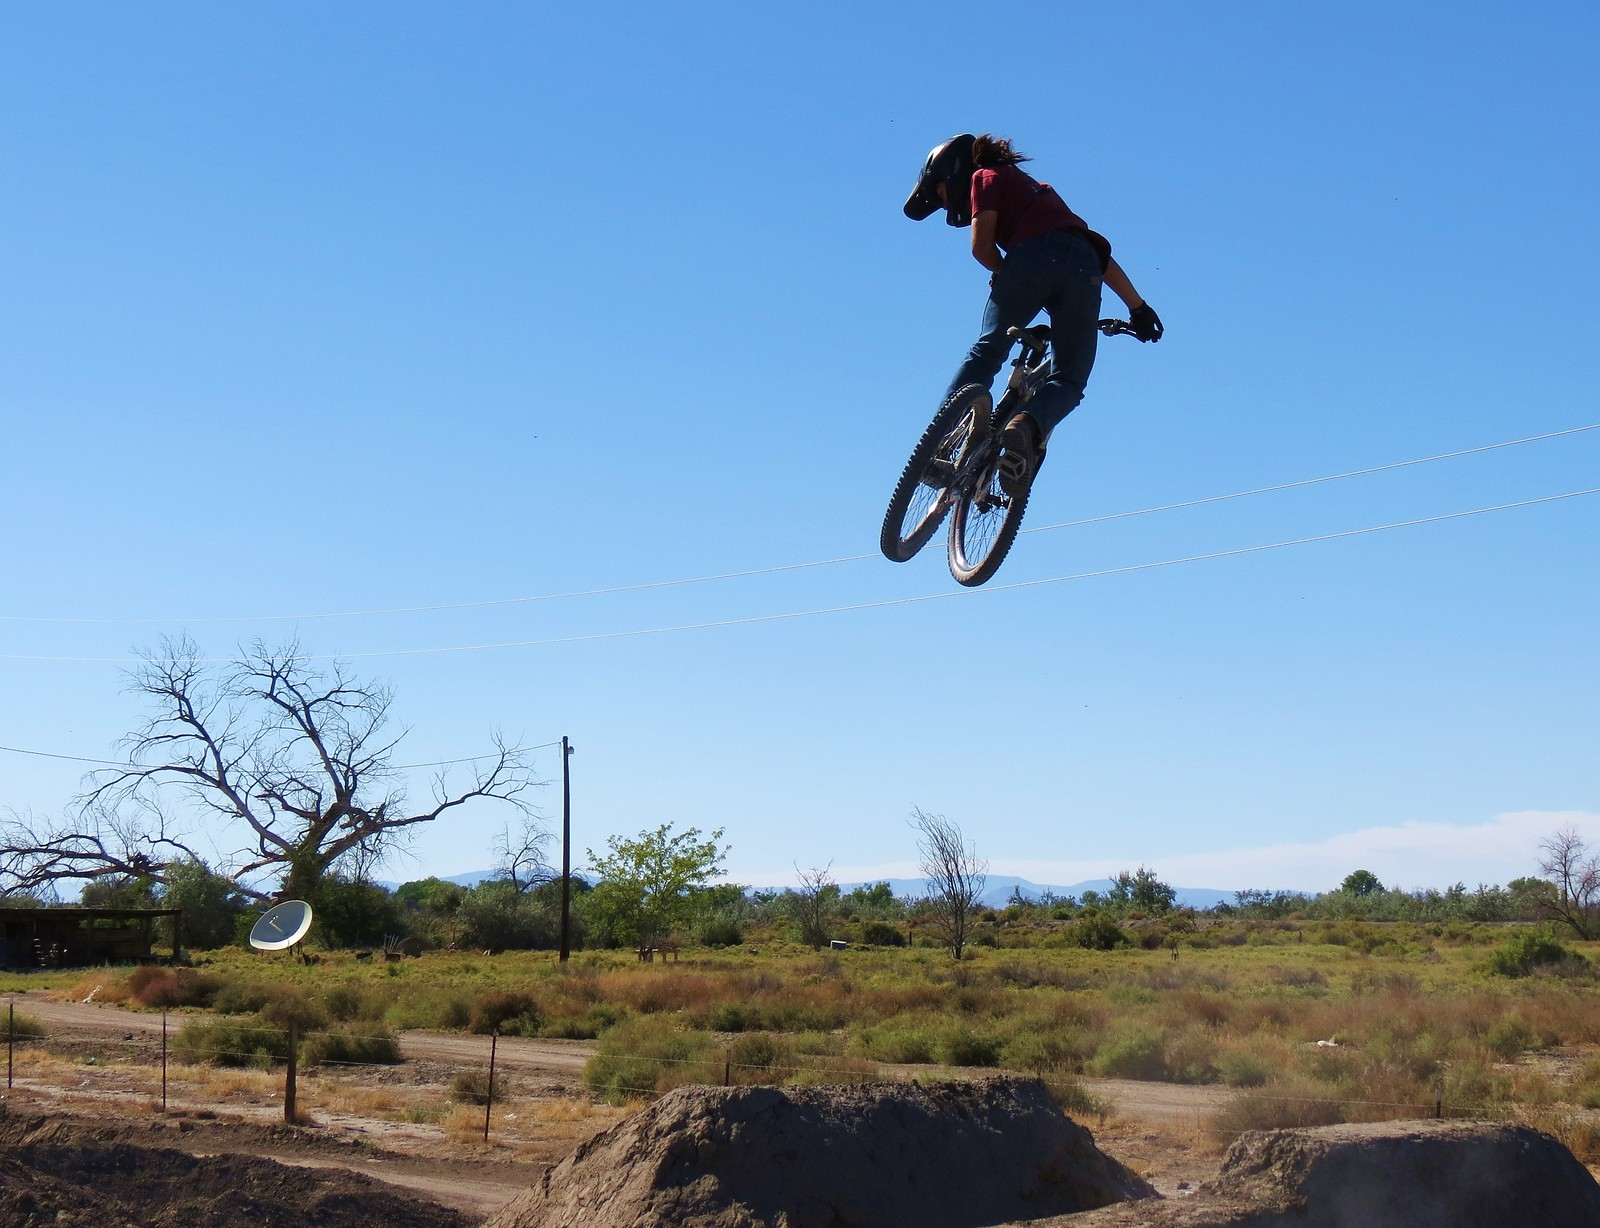 IMG 3876 (2) - Moosey - Mountain Biking Pictures - Vital MTB